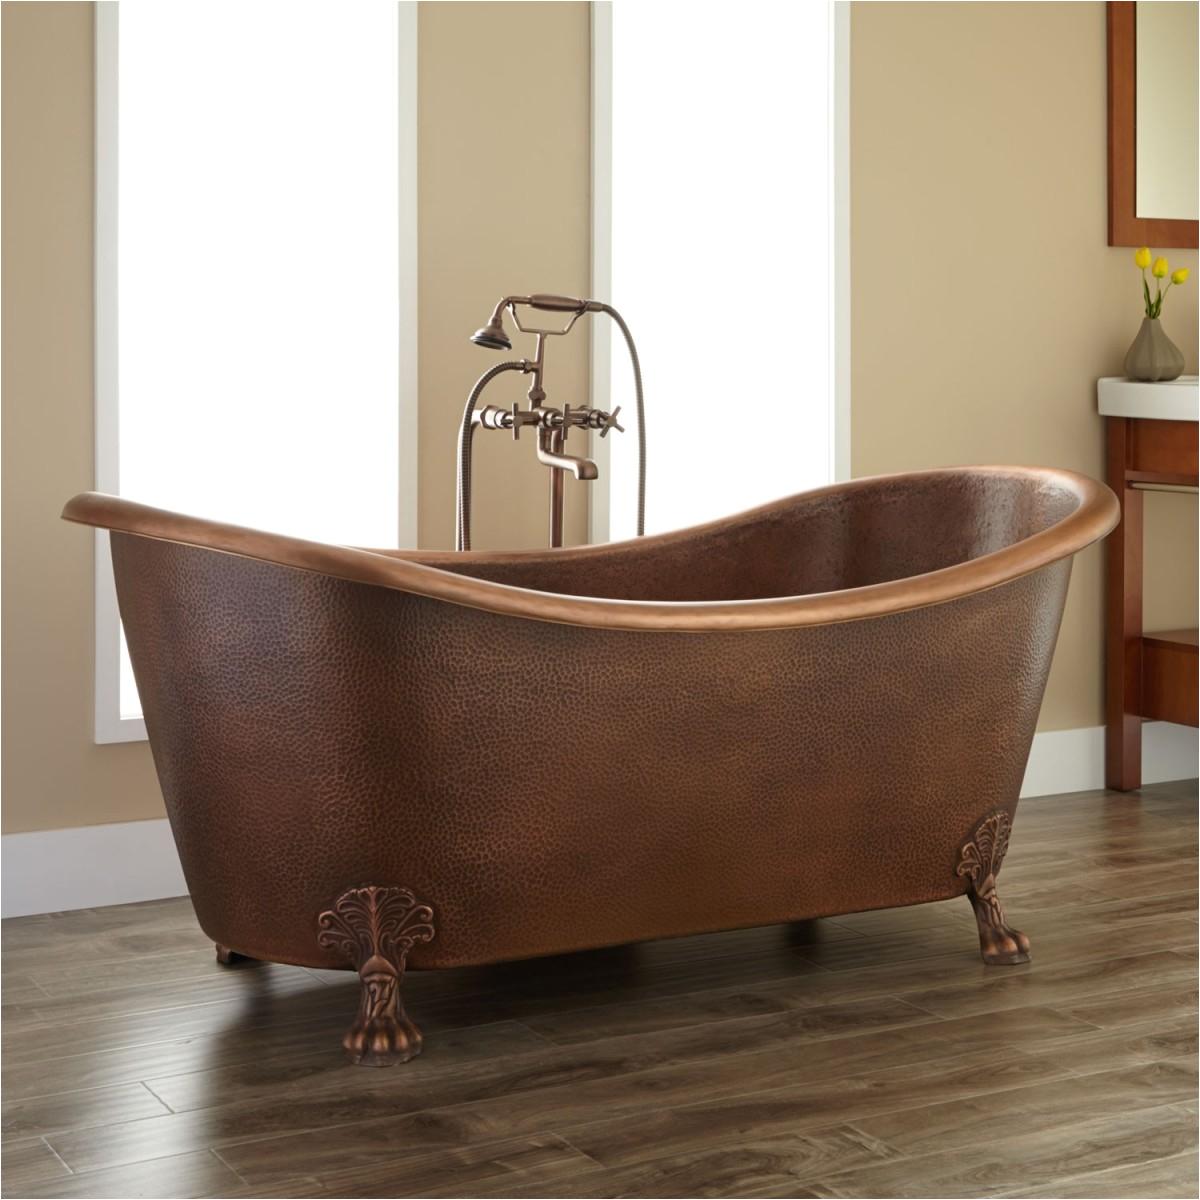 the elegance and charm of the clawfoot bathtub